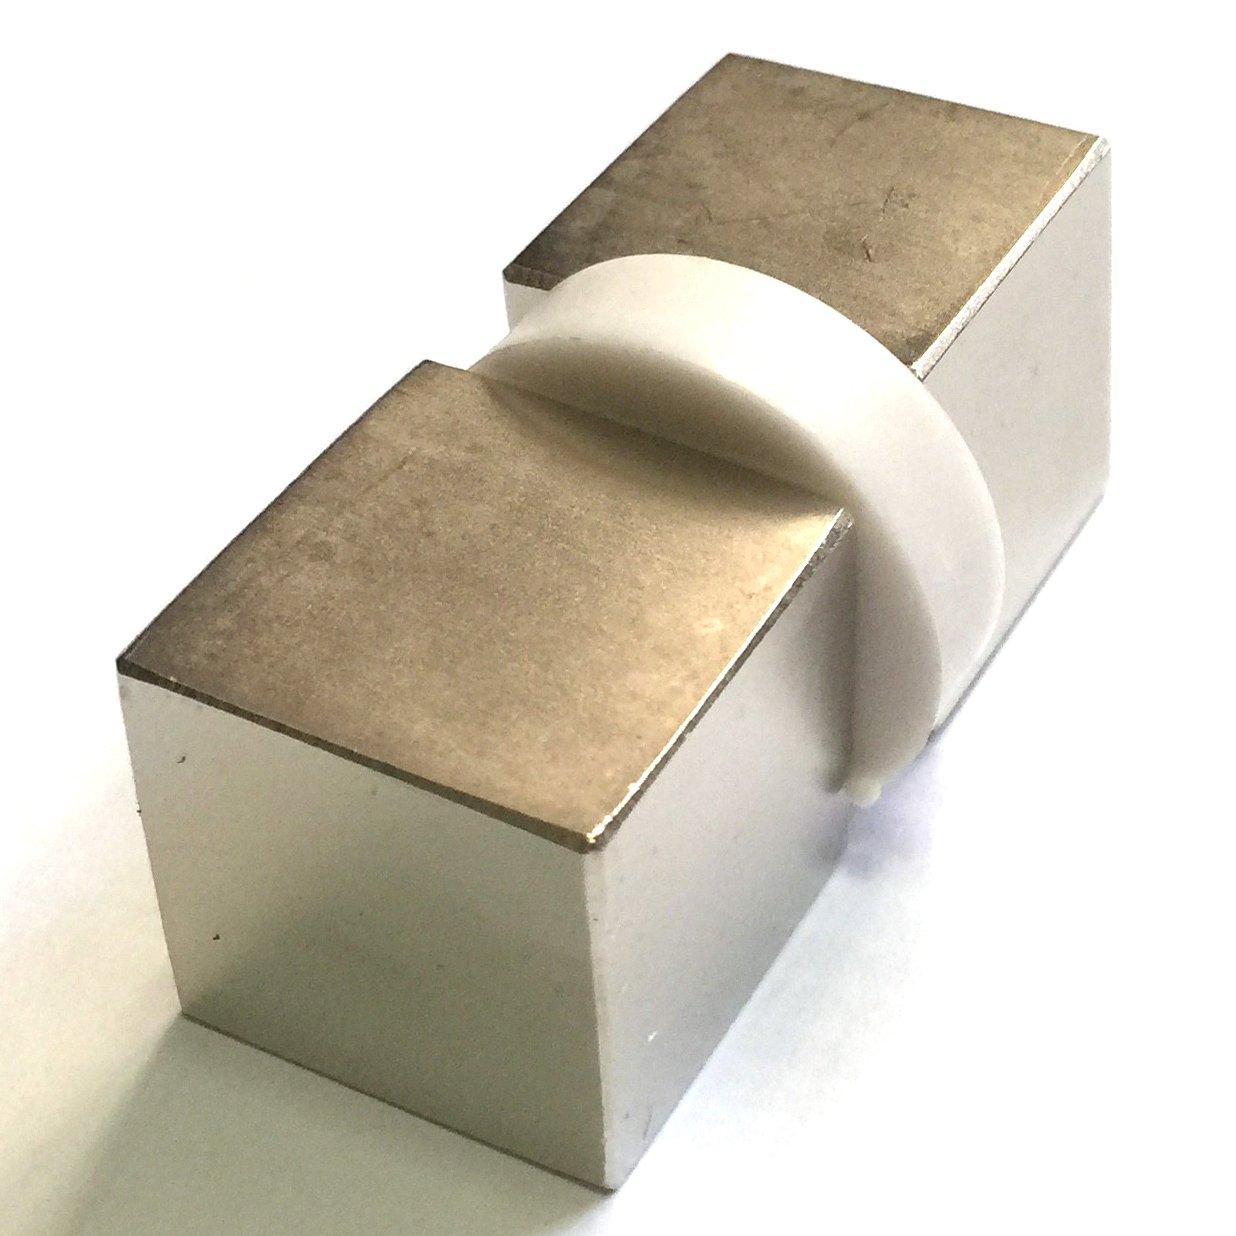 2pcs SUNKEE 1 Cube Block Neodymium Magnet 1 x 1 x 1 Rare Earth Neodymium strong magnet